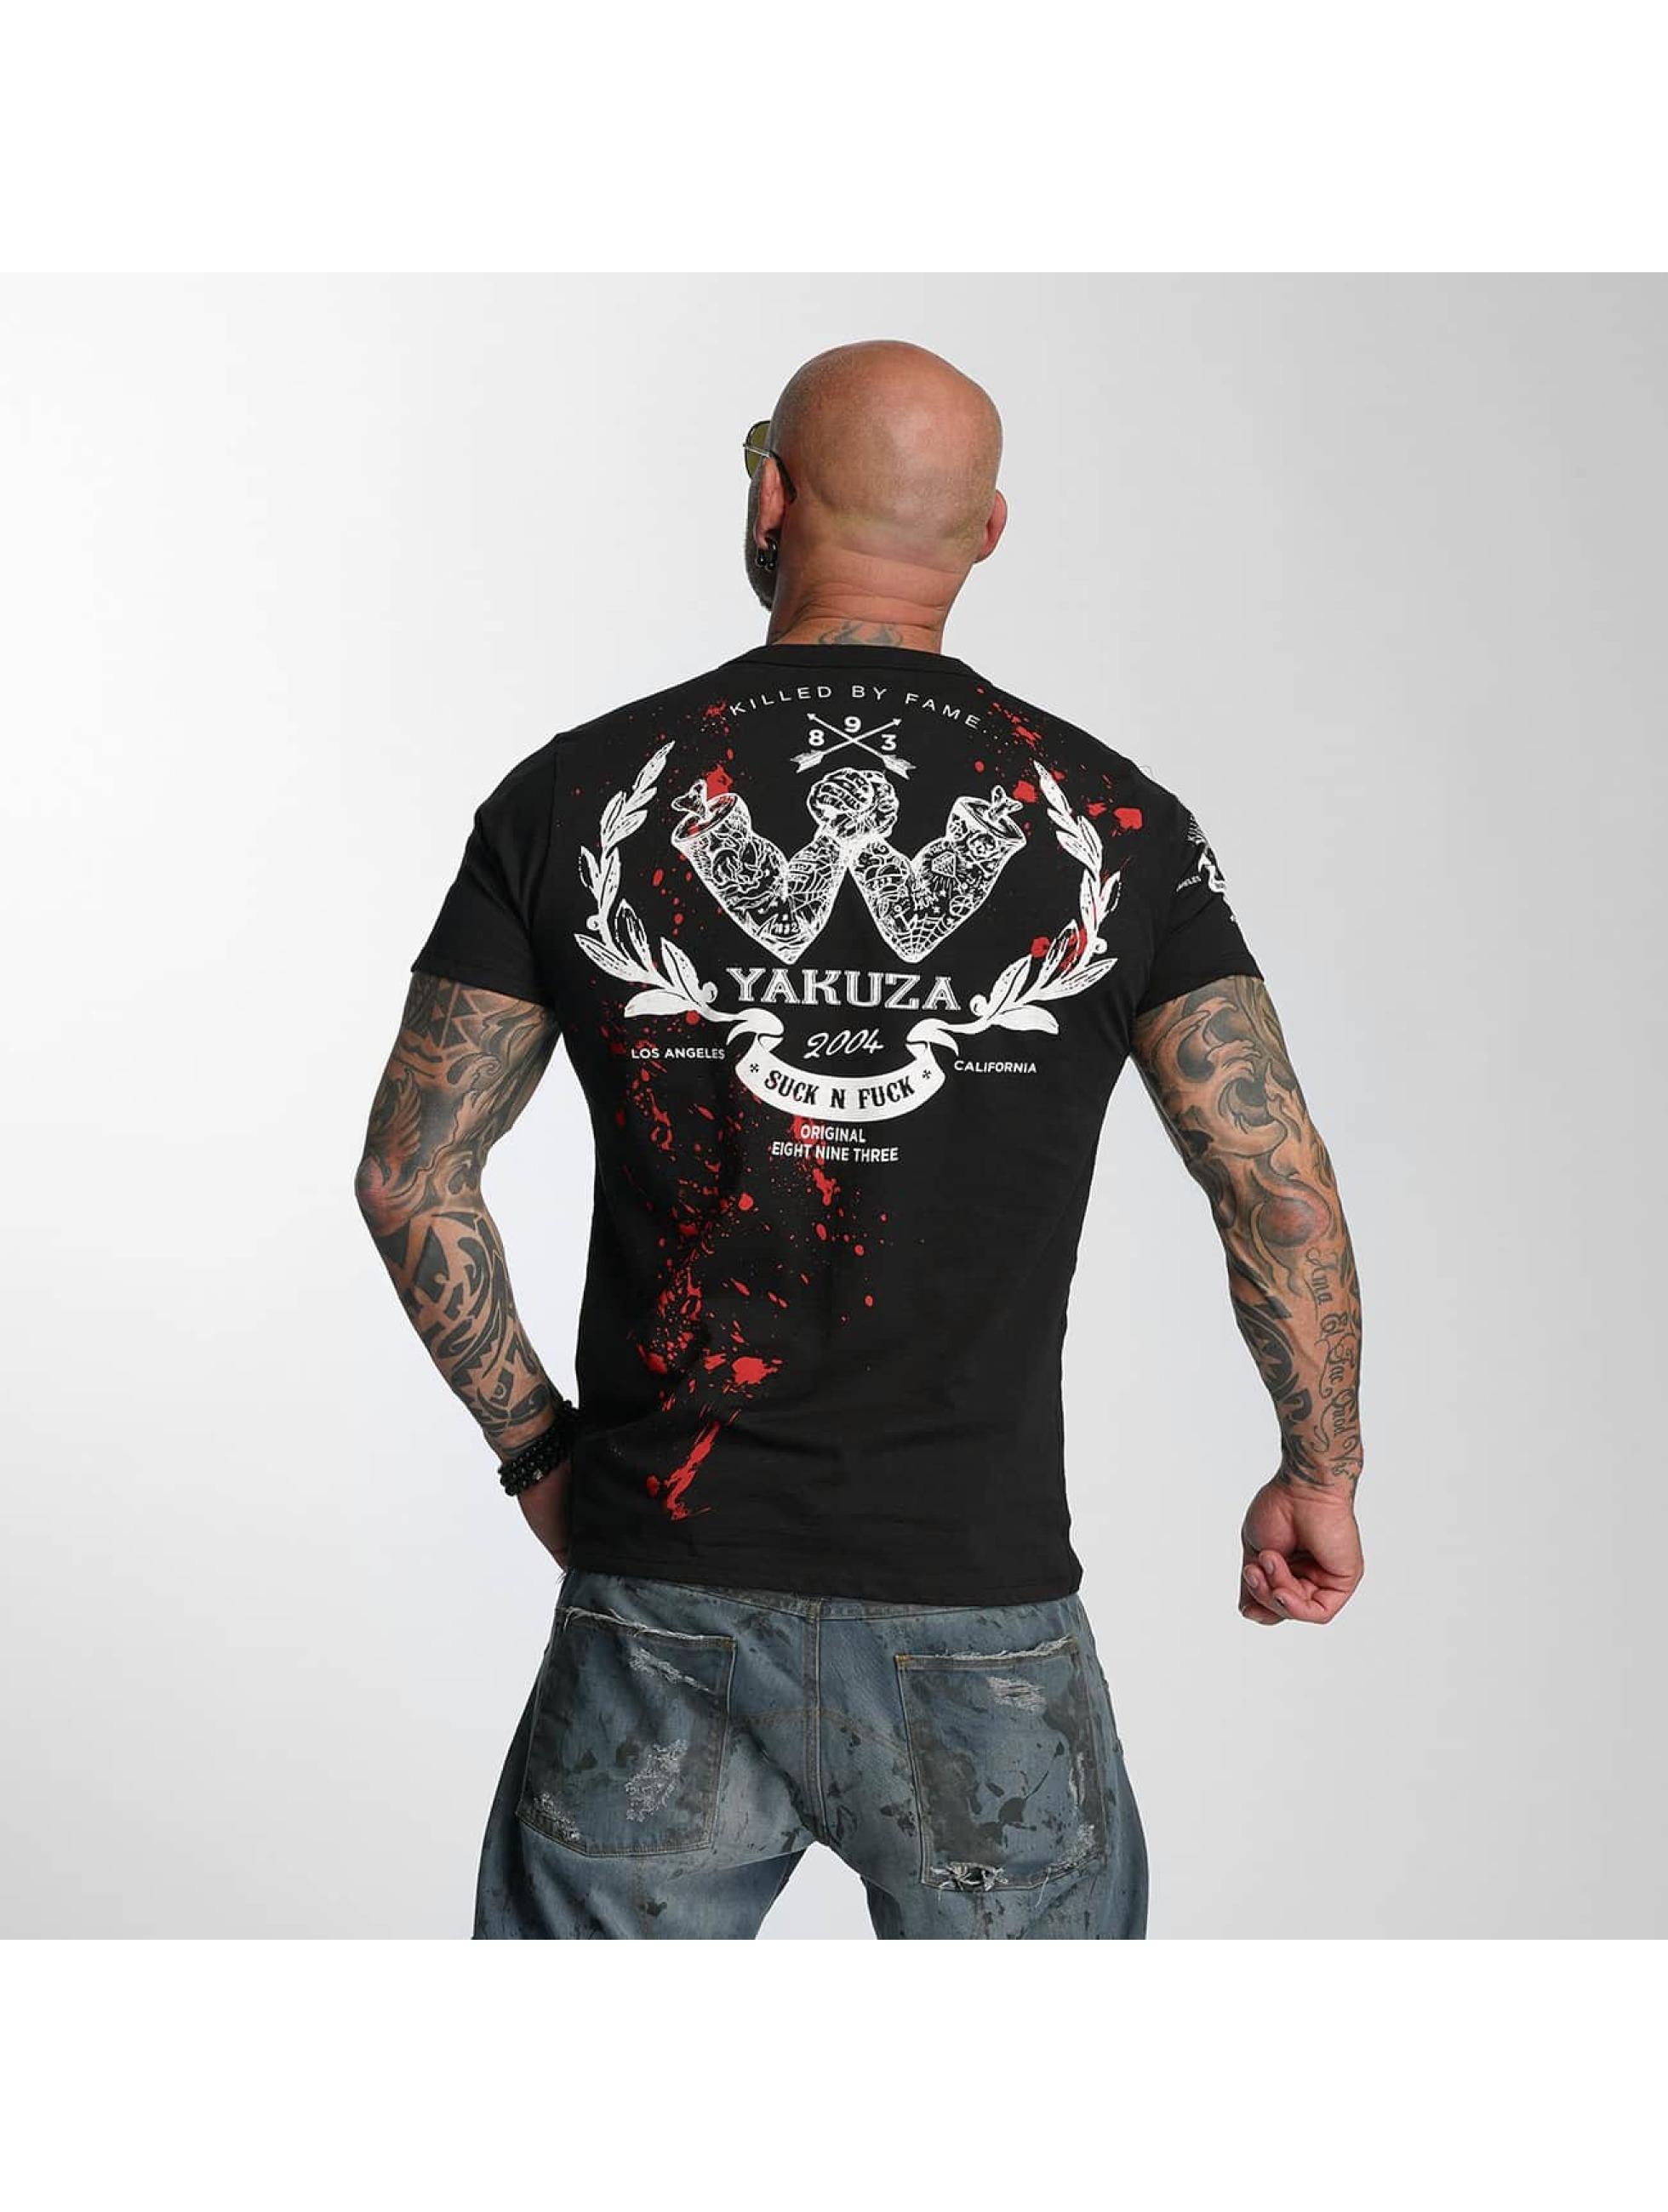 Yakuza T-Shirt Killed By Fame black